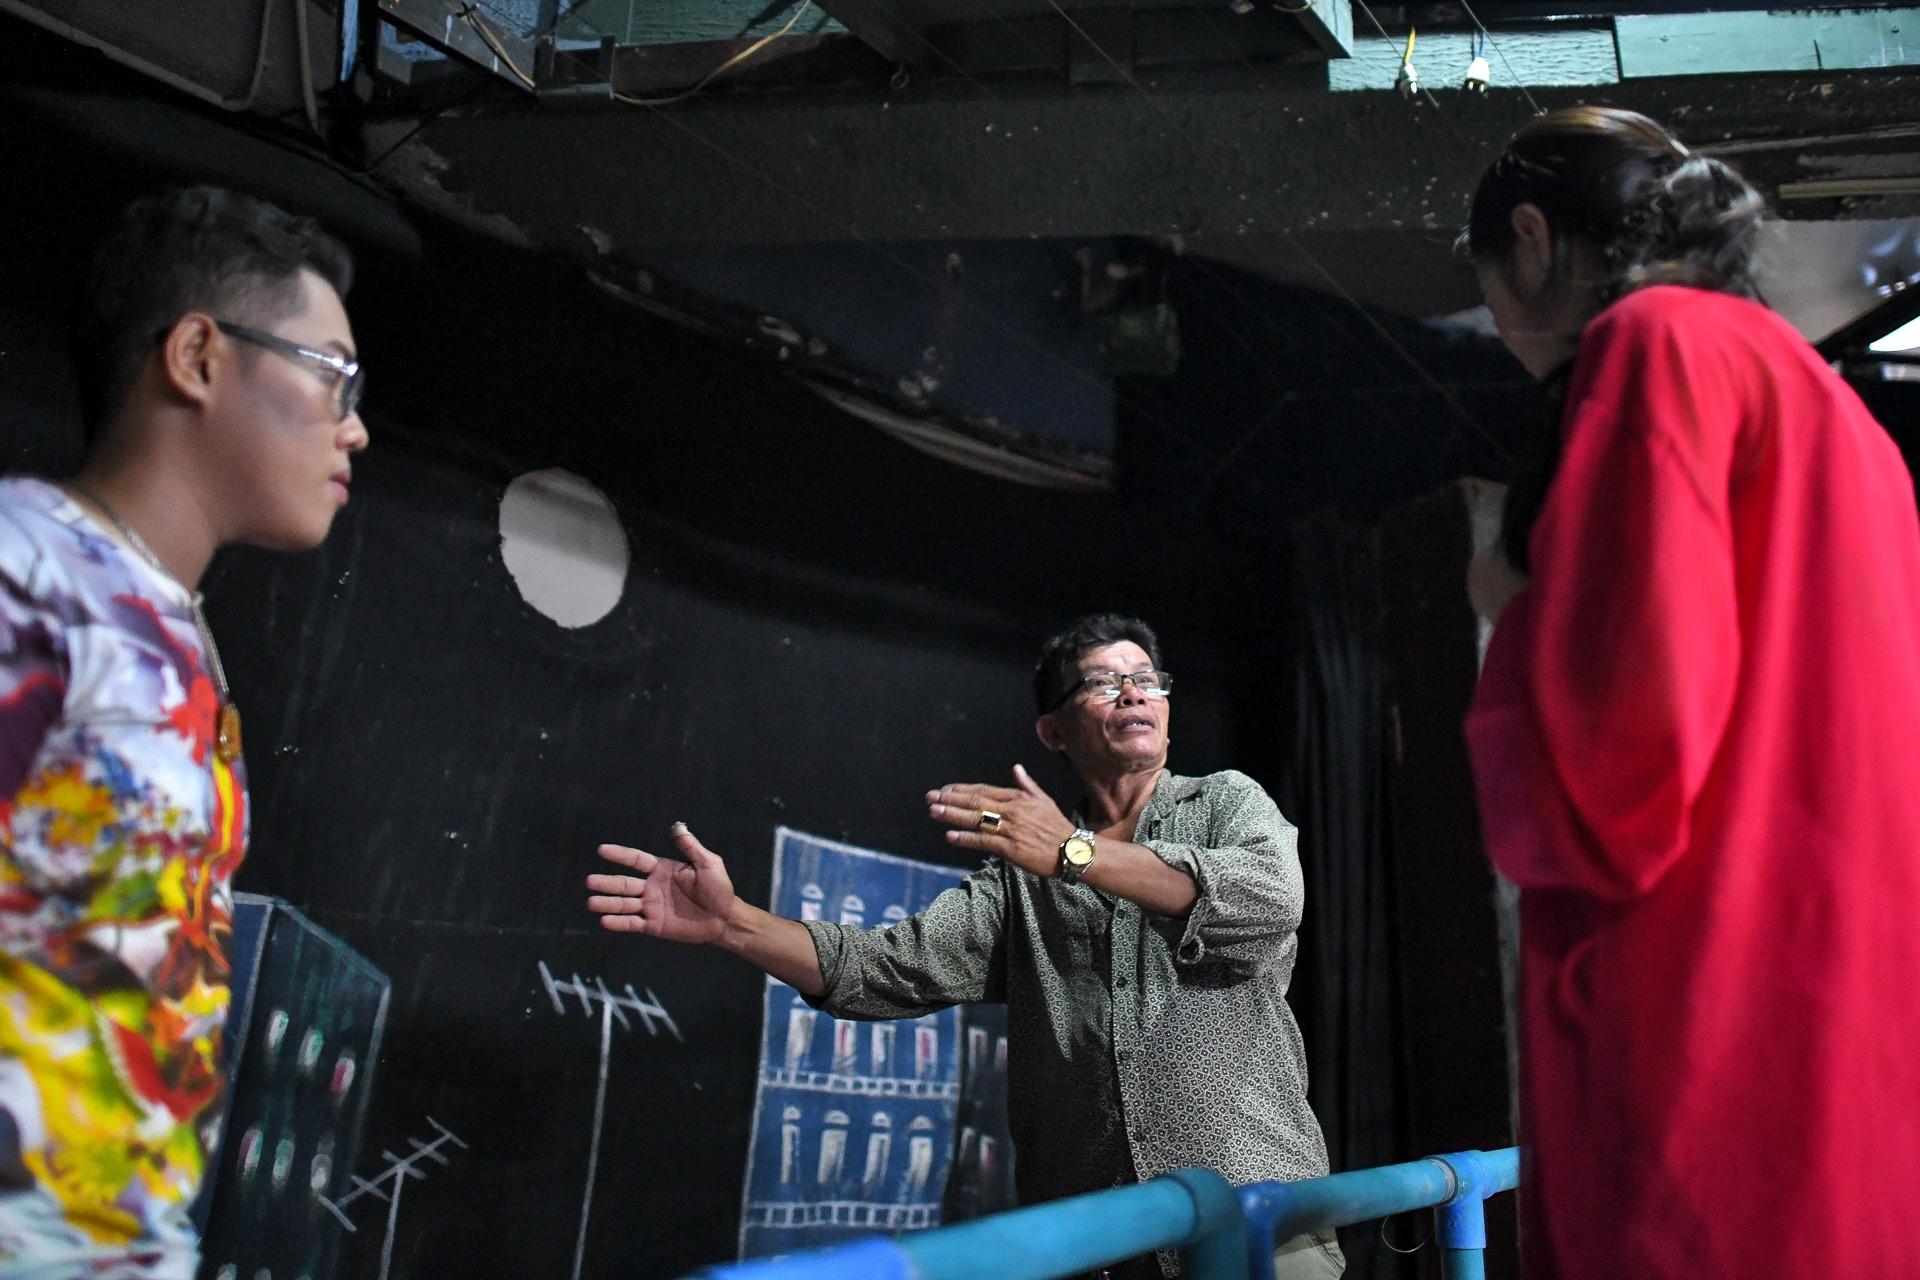 Dem dien cuoi o san khau Hong Van: Chuyen sau tam man nhung hinh anh 7